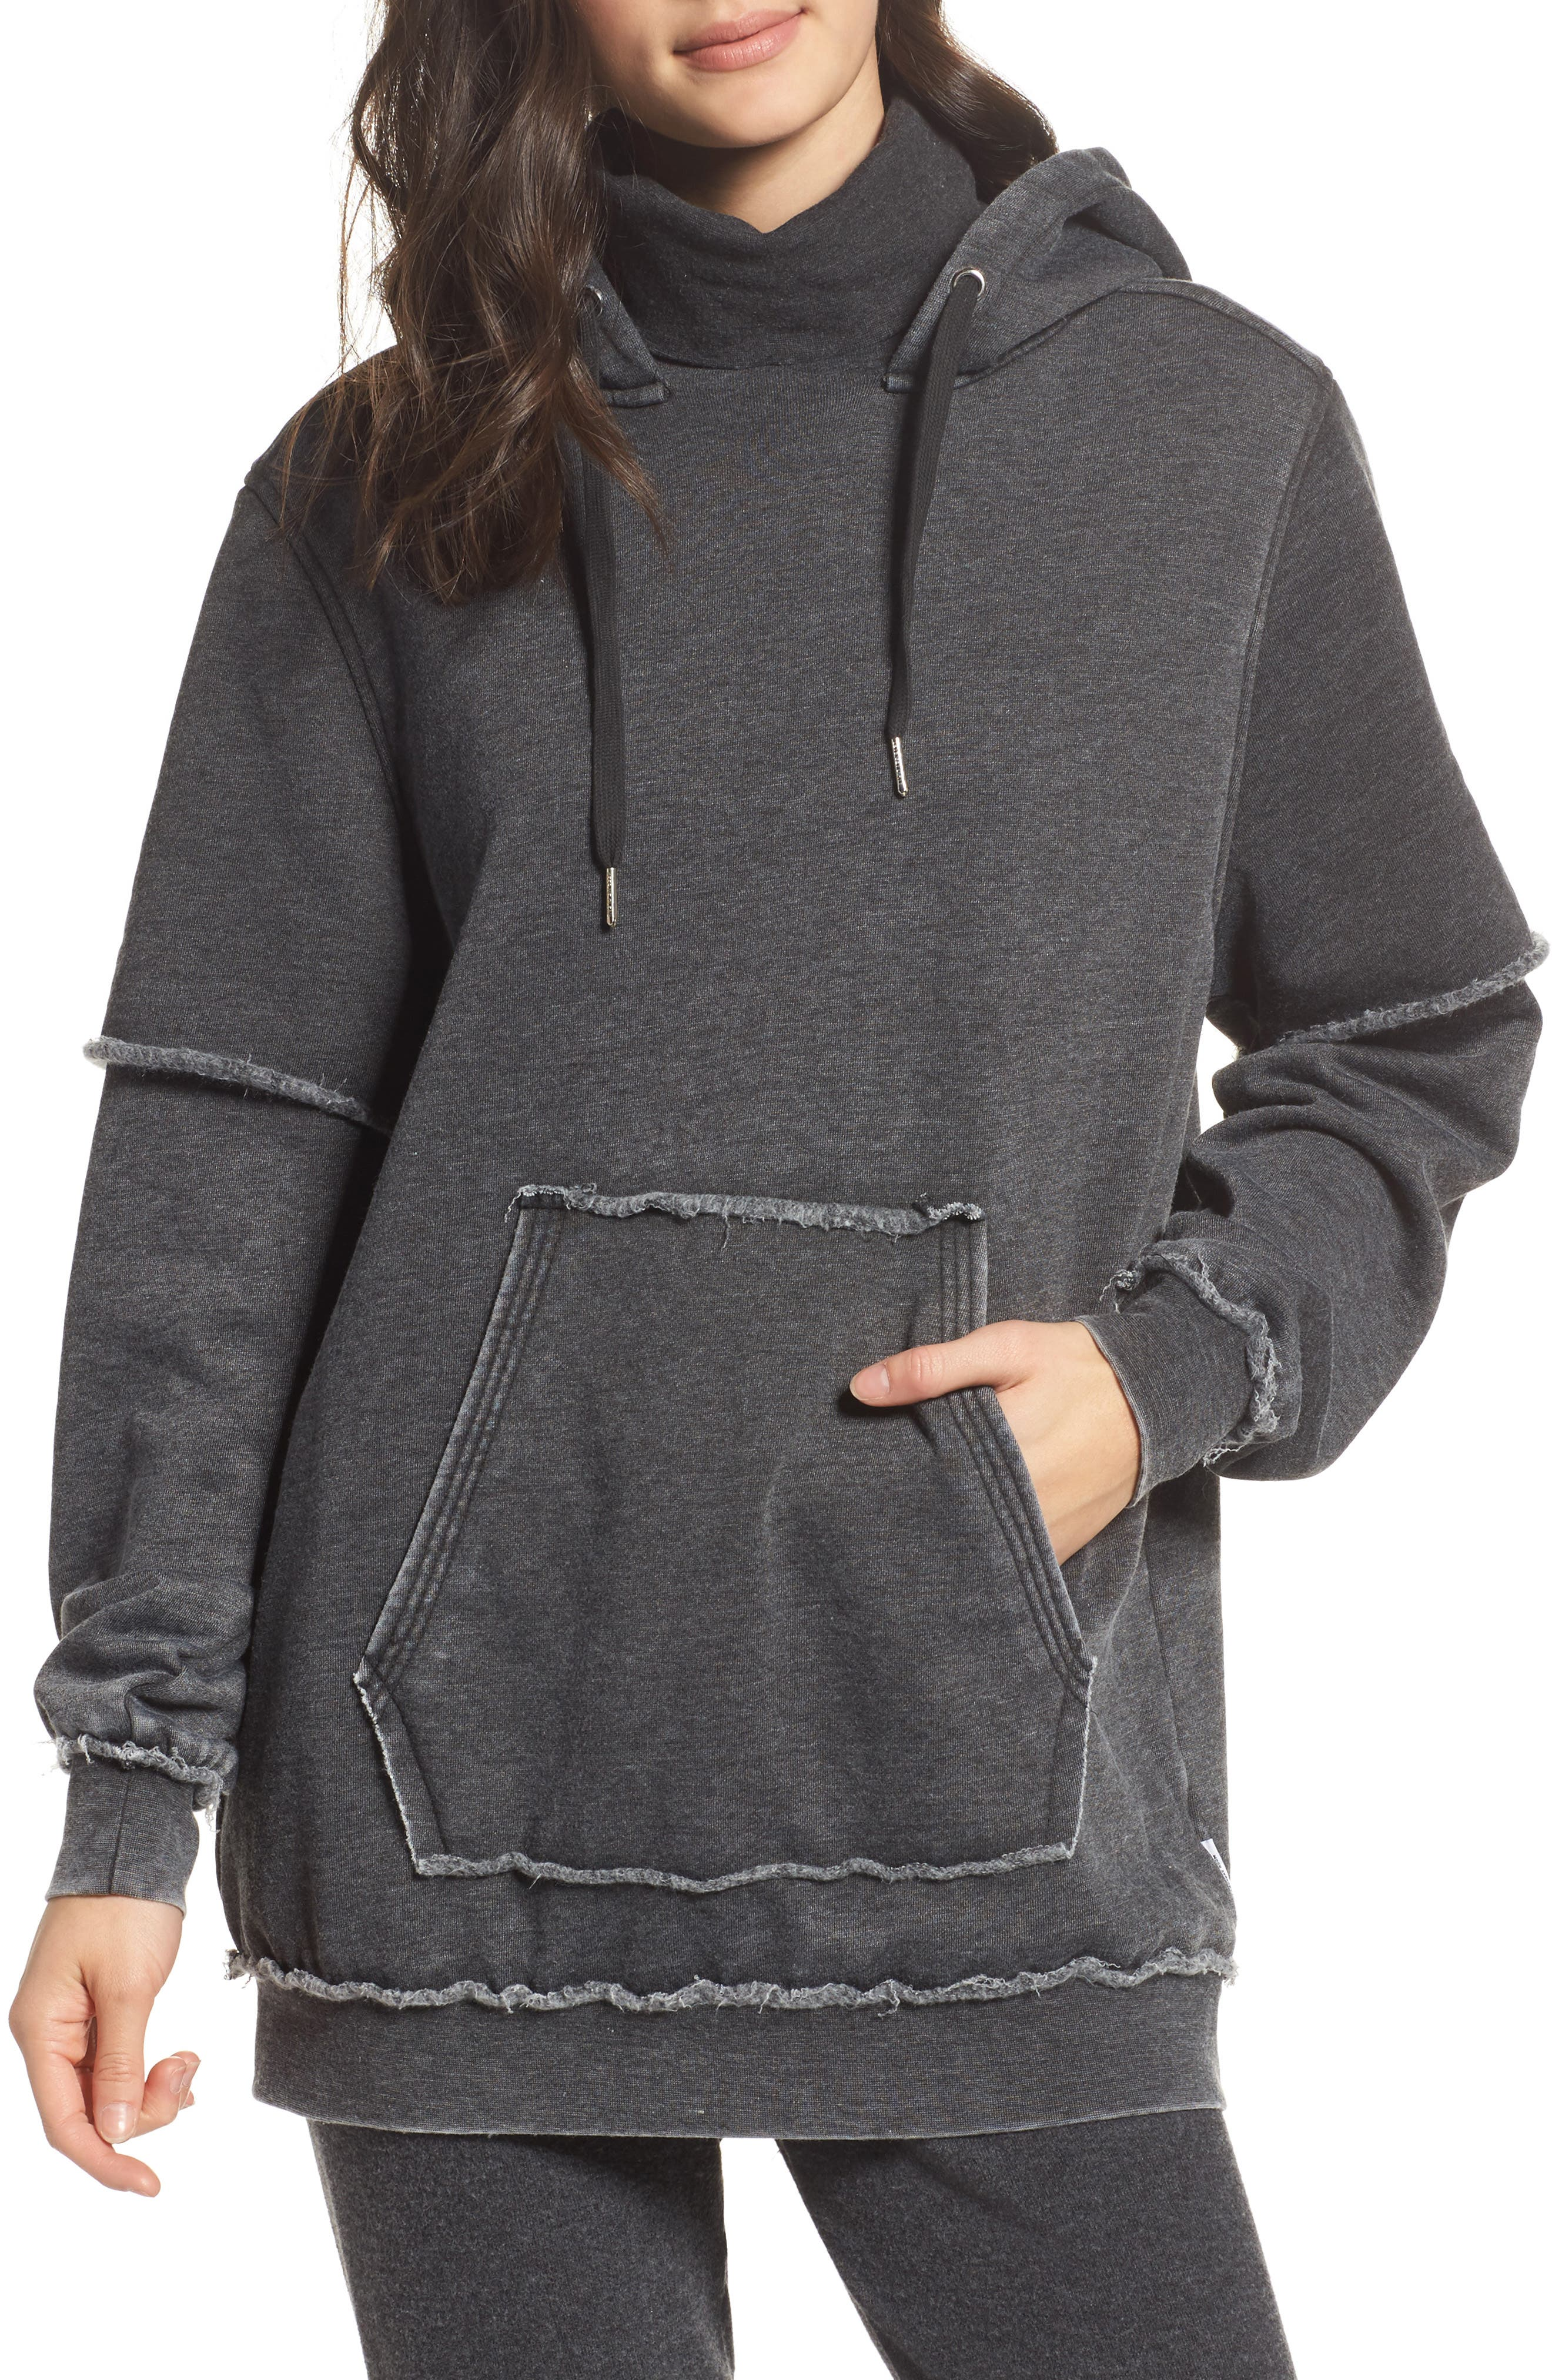 Alternate Image 1 Selected - The Laundry Room Good Hood Sweatshirt Dress